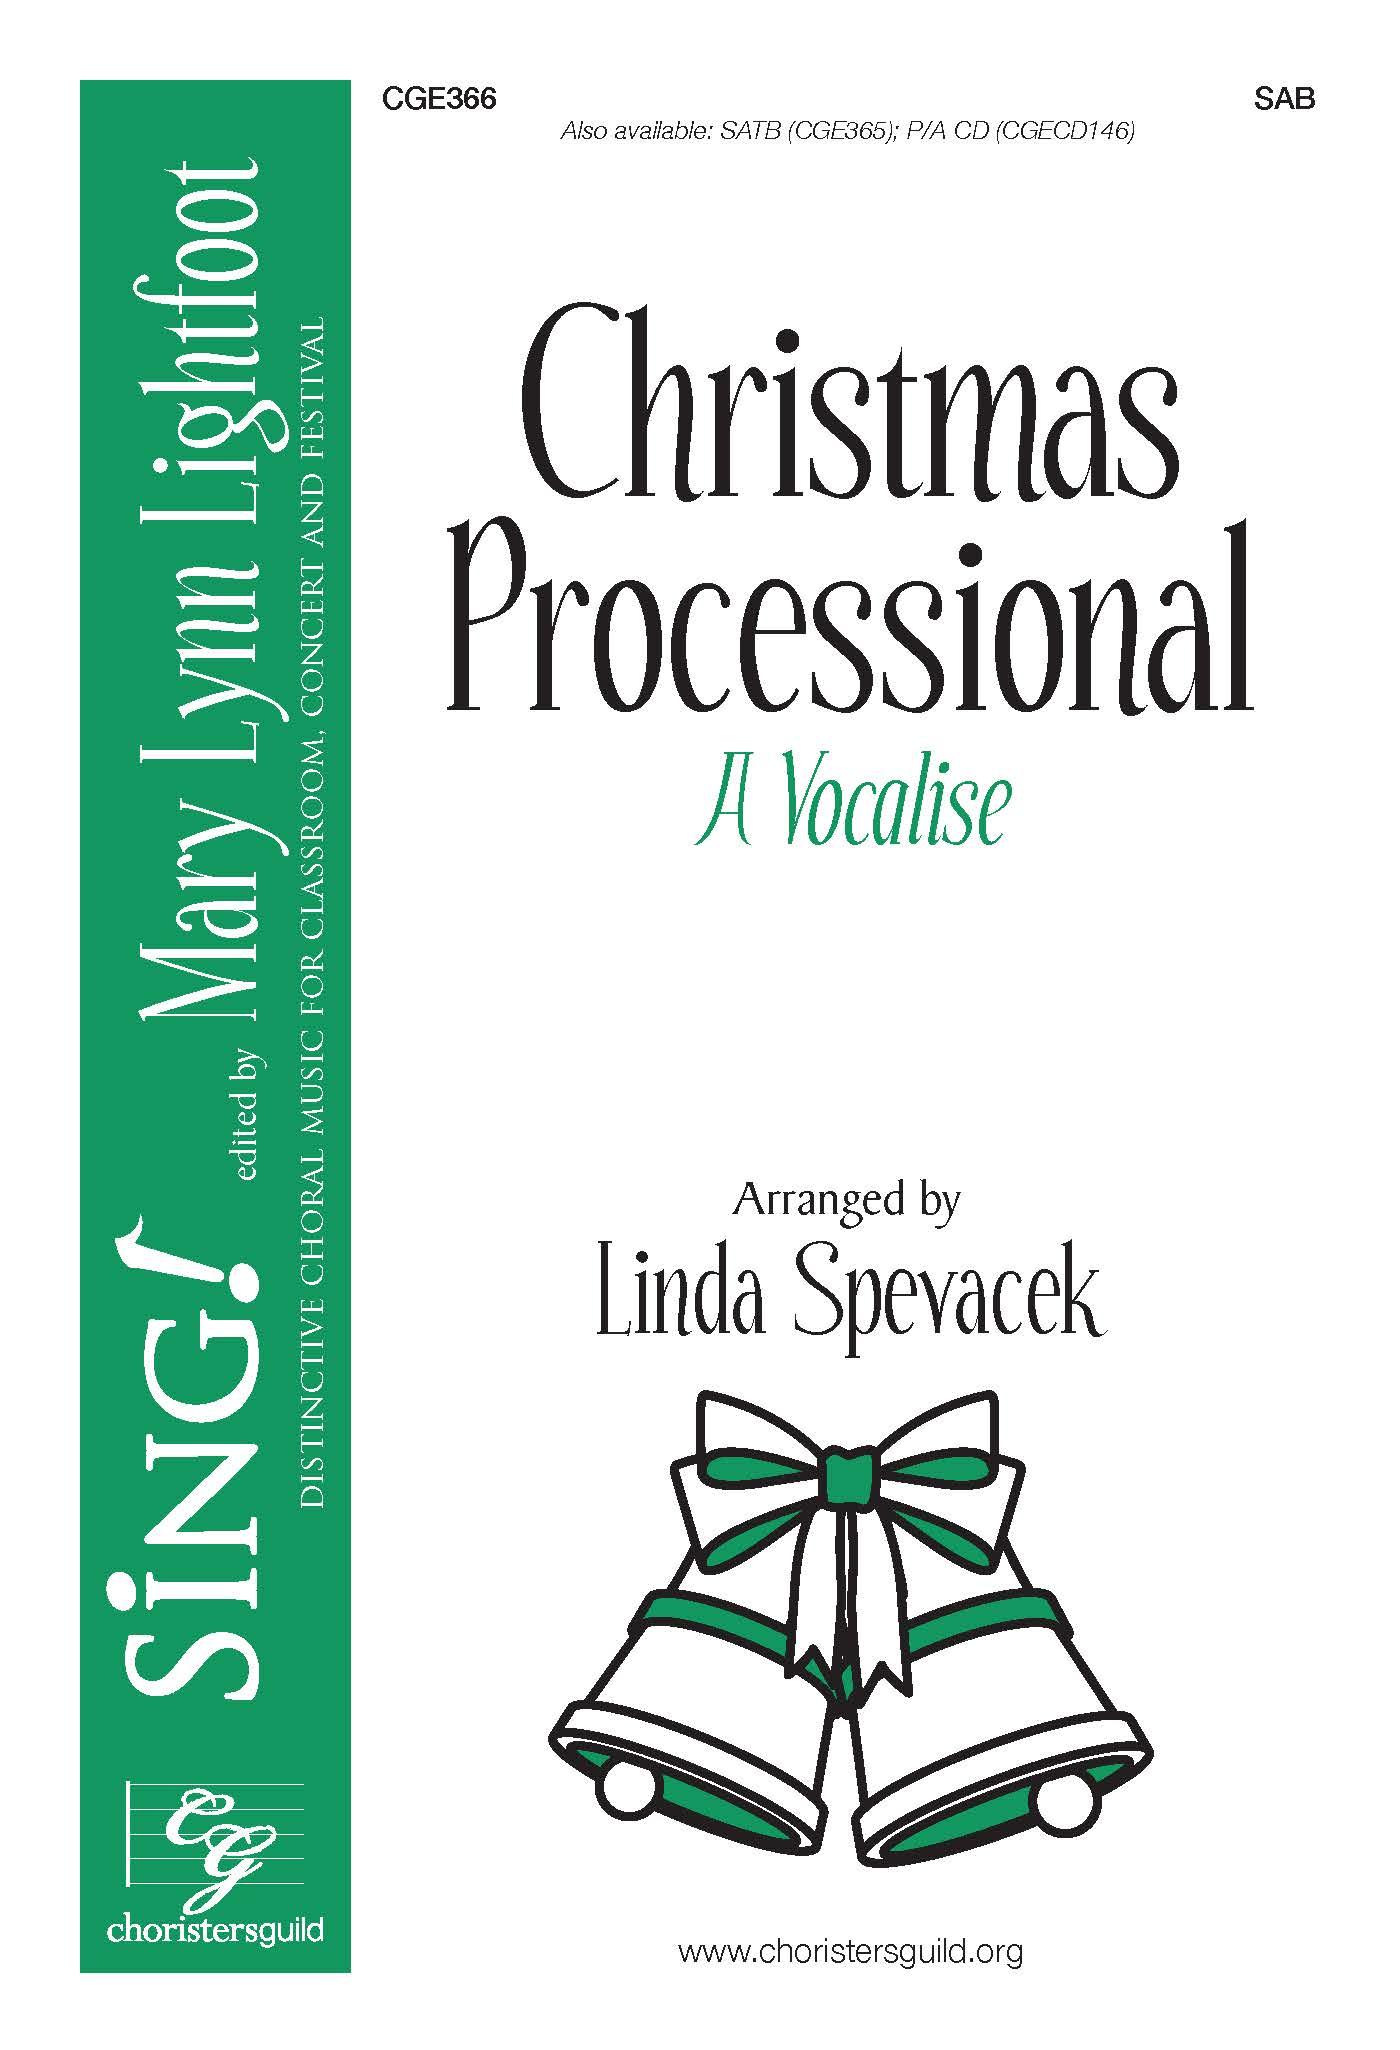 Christmas Processional (A Vocalise) - SAB